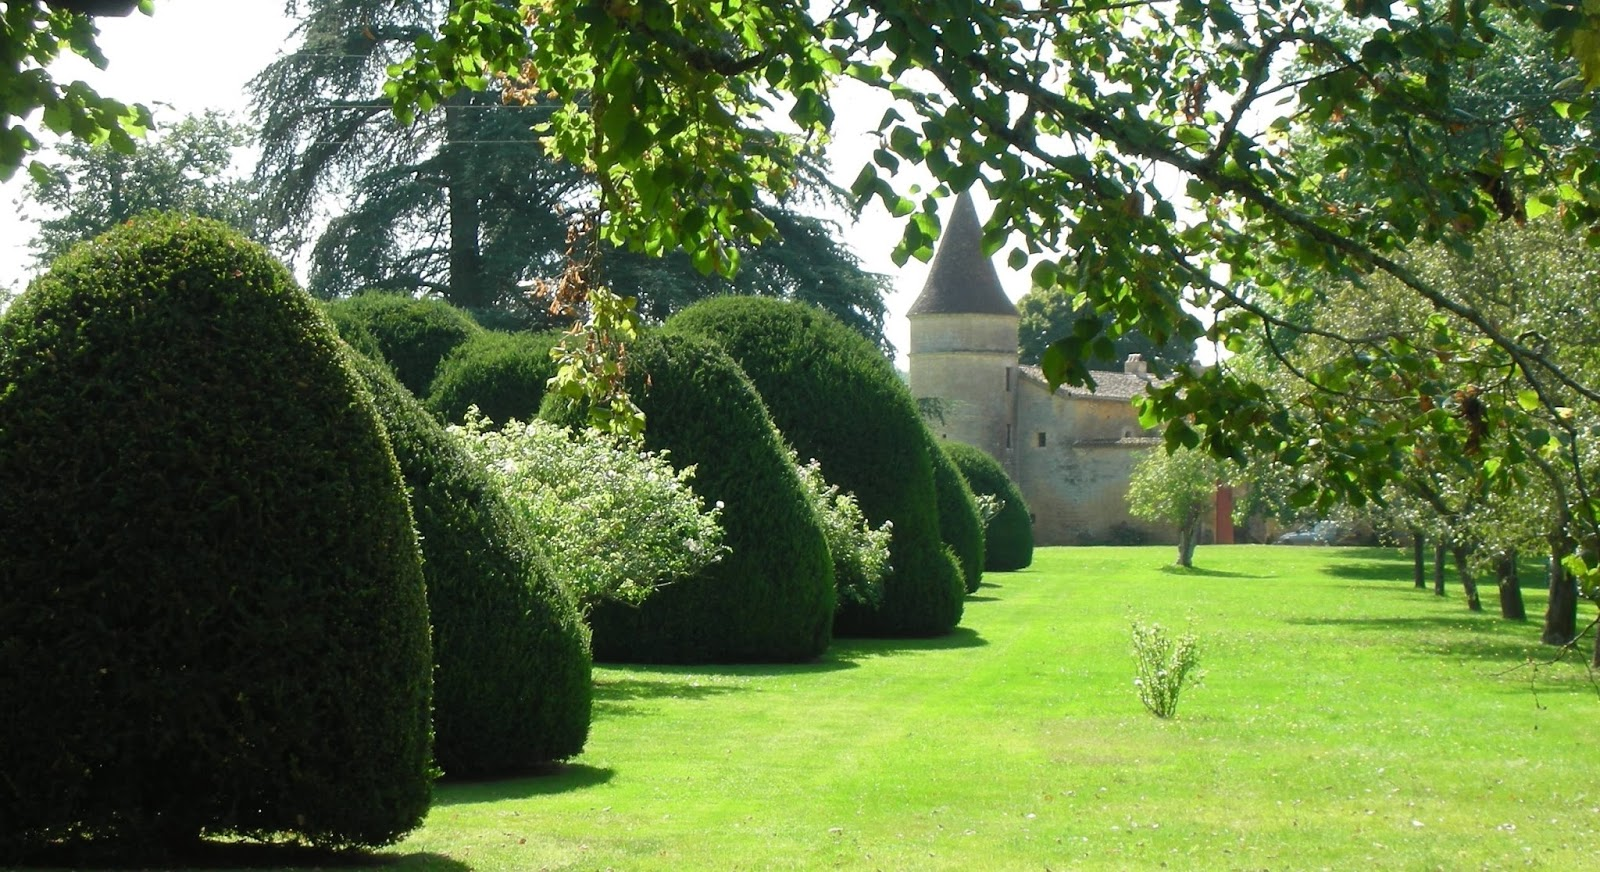 Hortibus du 4 au 8 septembre 2015 voyage jardins for Jardin septembre 2015